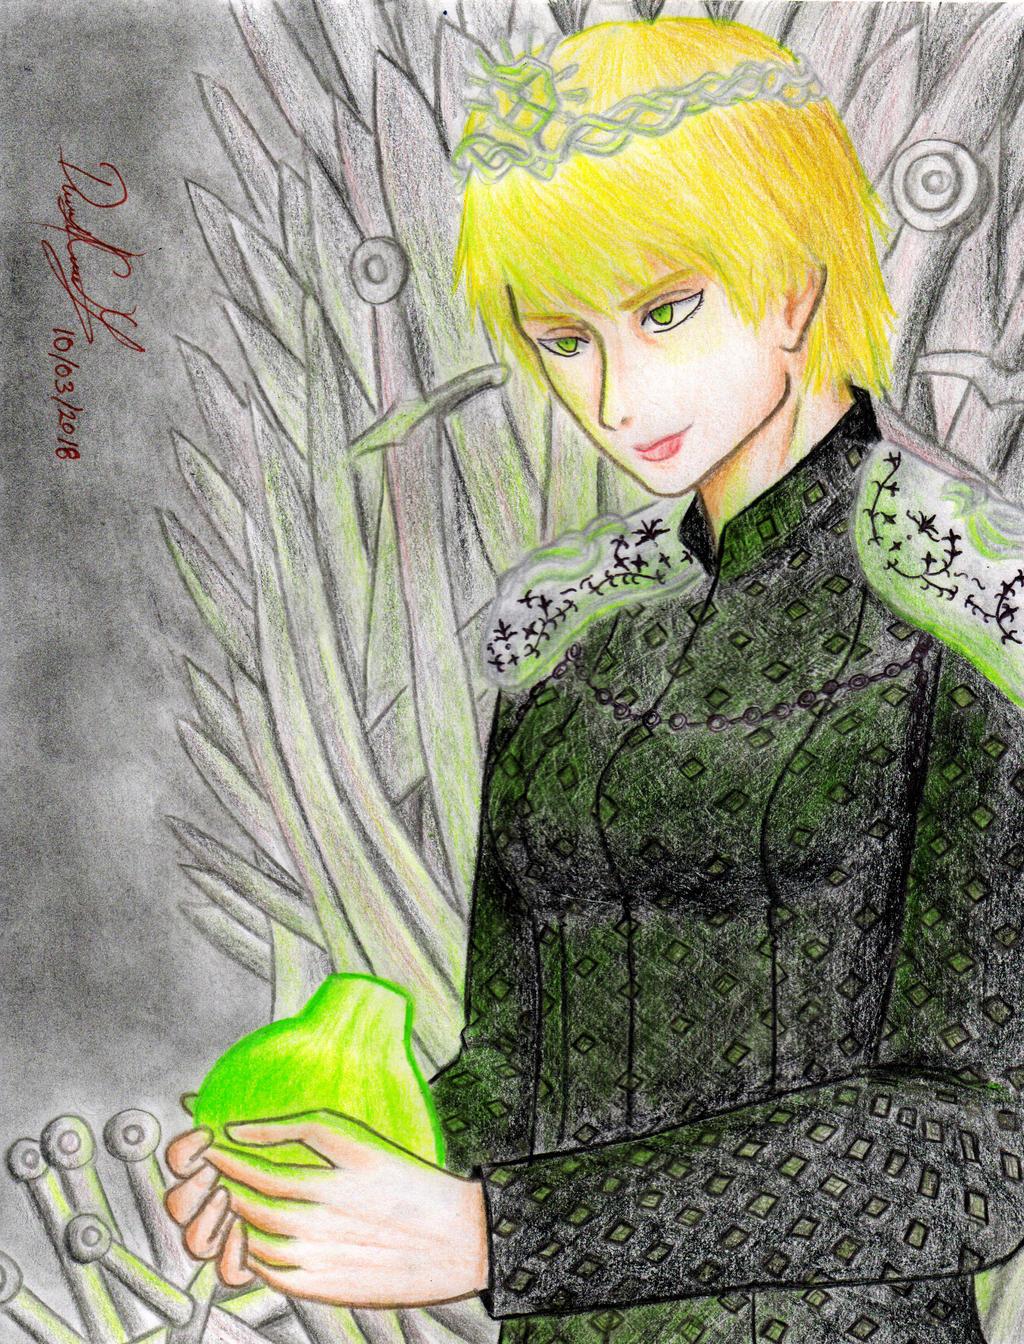 Cersei Lannister (TV show version) by danielcamilo